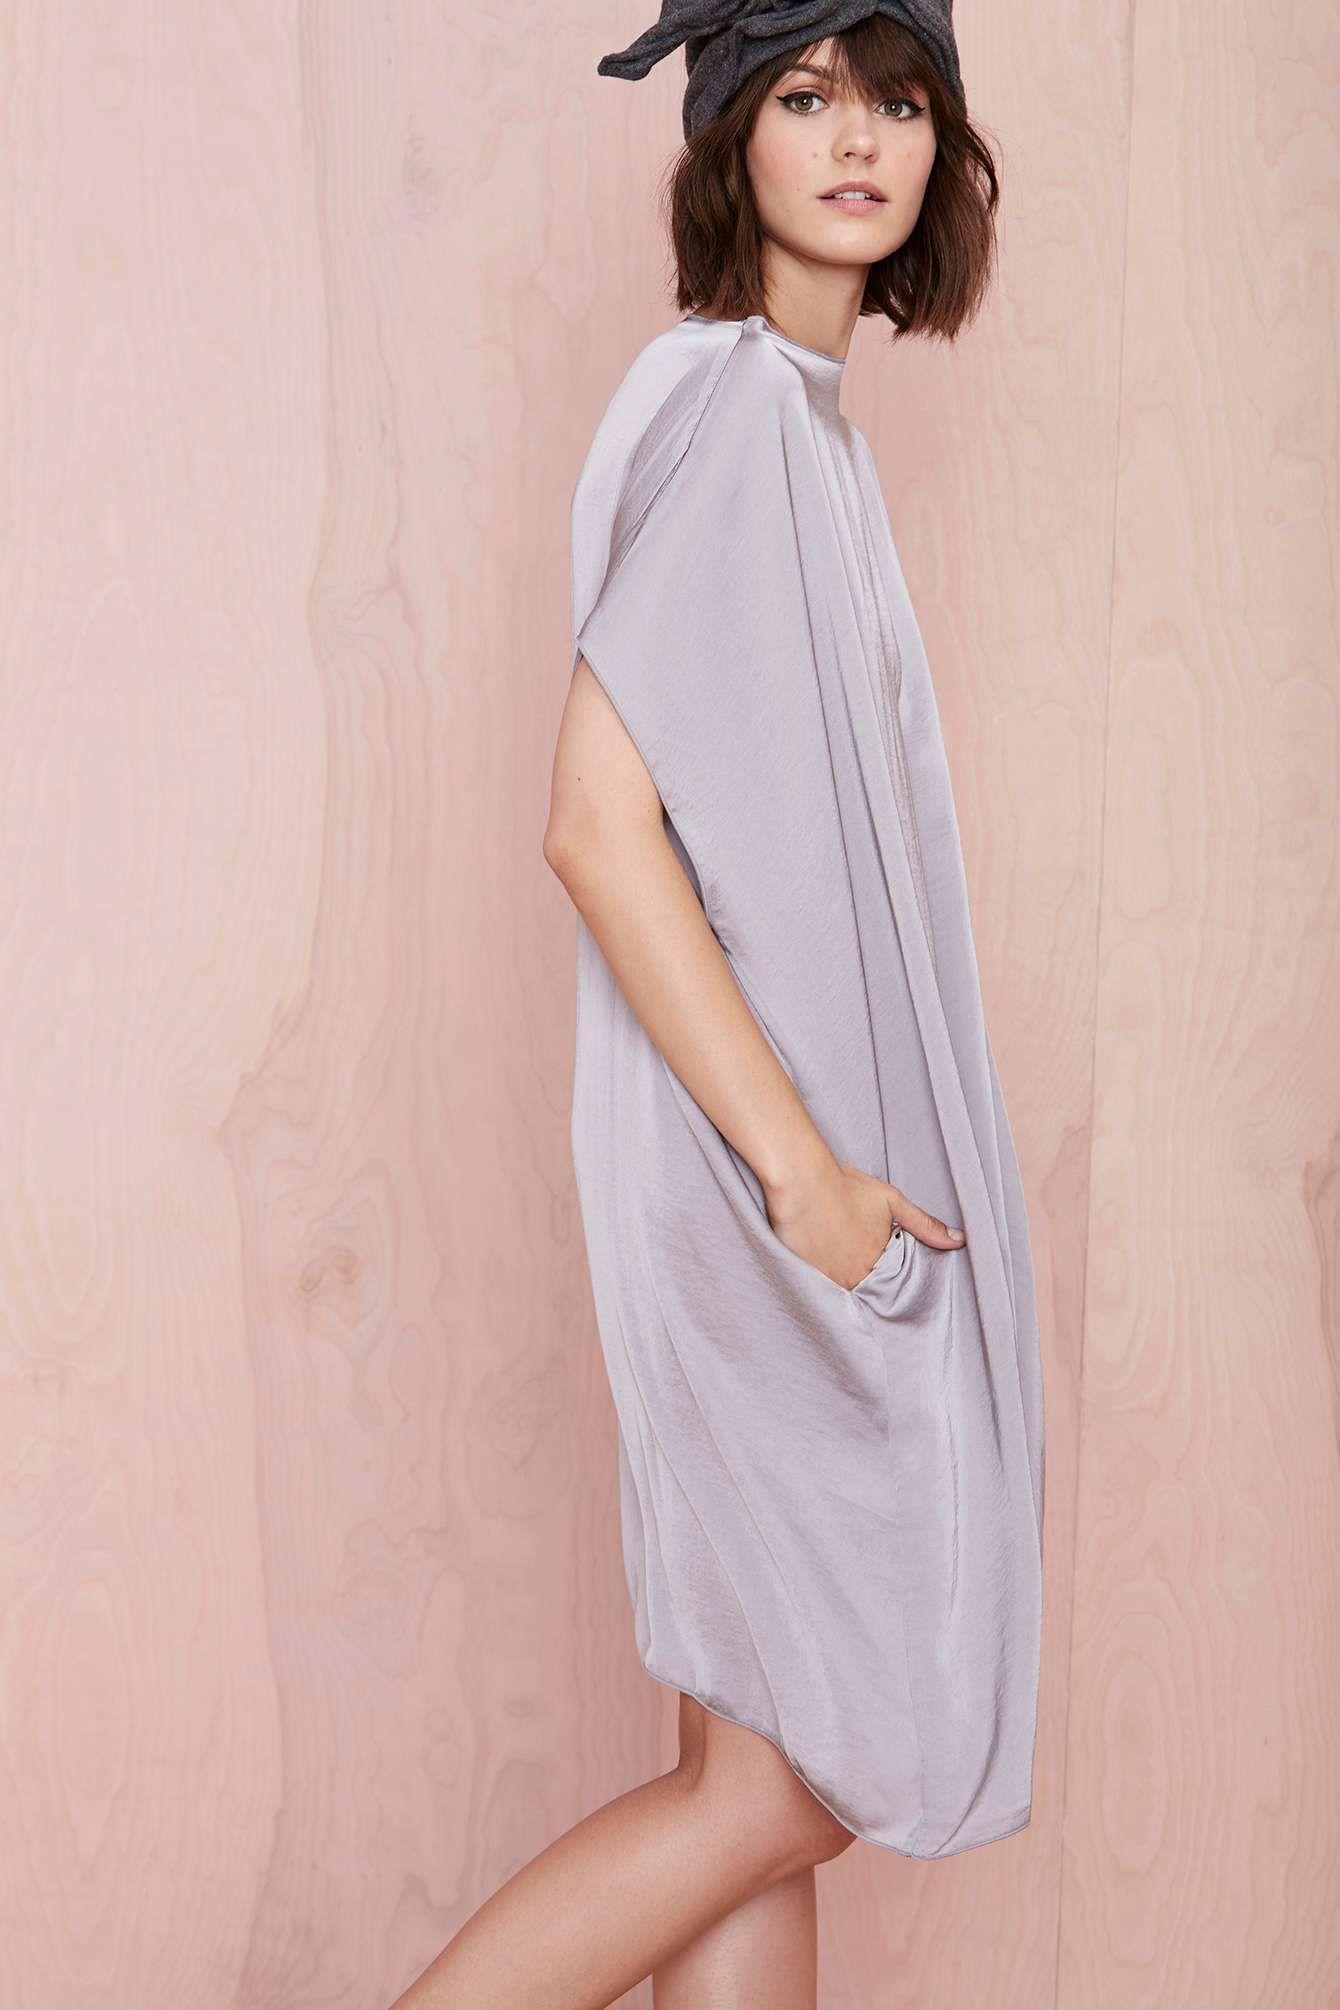 Hot pink maternity maxi dress  Cheap Monday Sky Dress  FRENCH WOMAN  Pinterest  Mondays Clothes